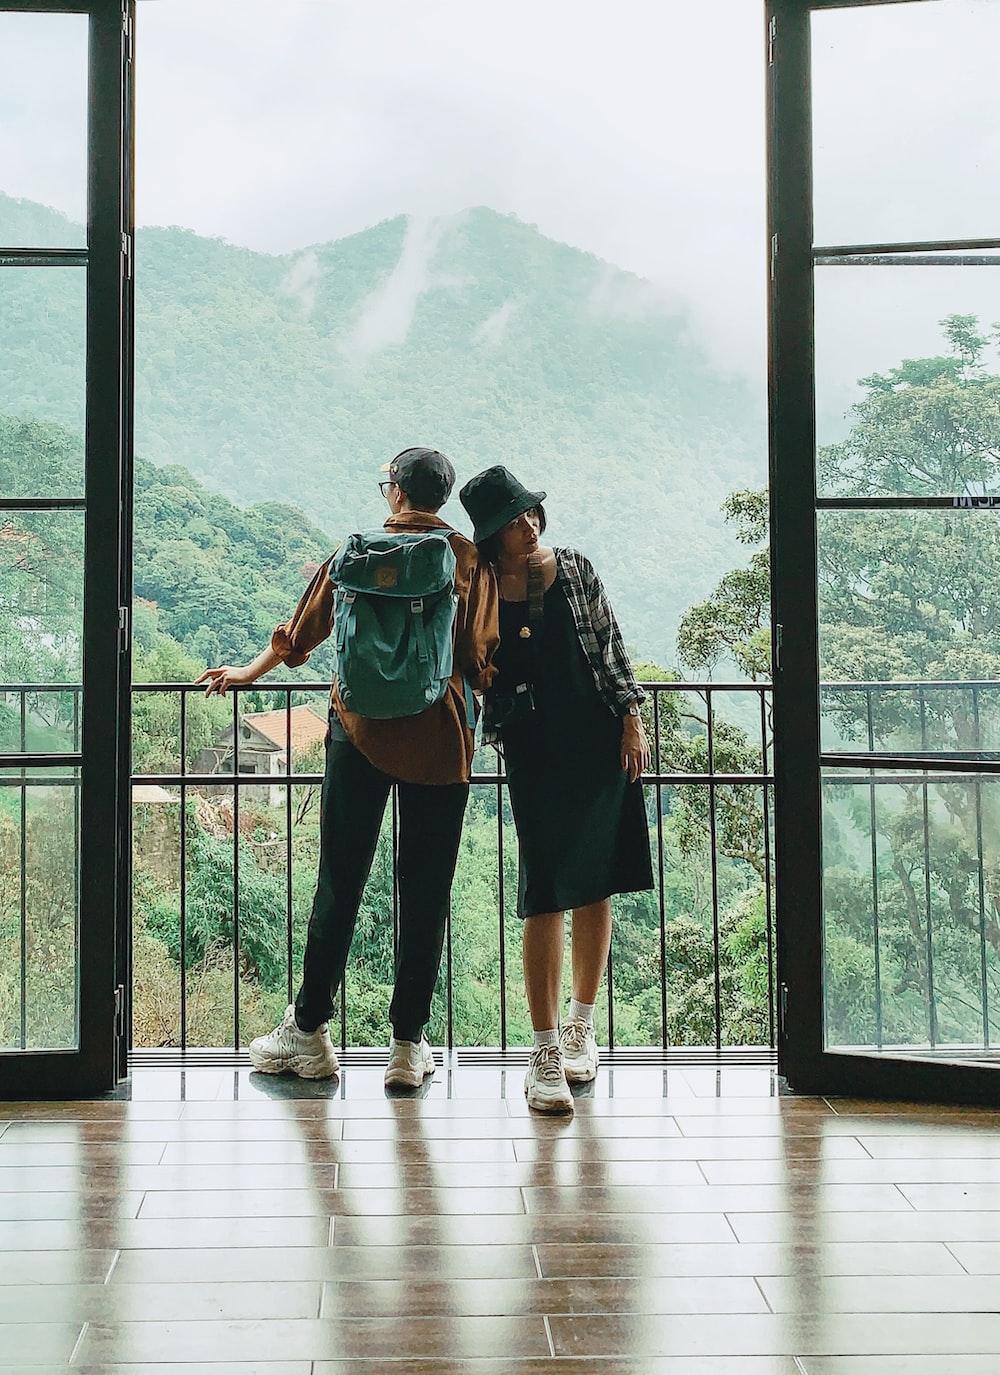 2 women standing on white wooden floor during daytime